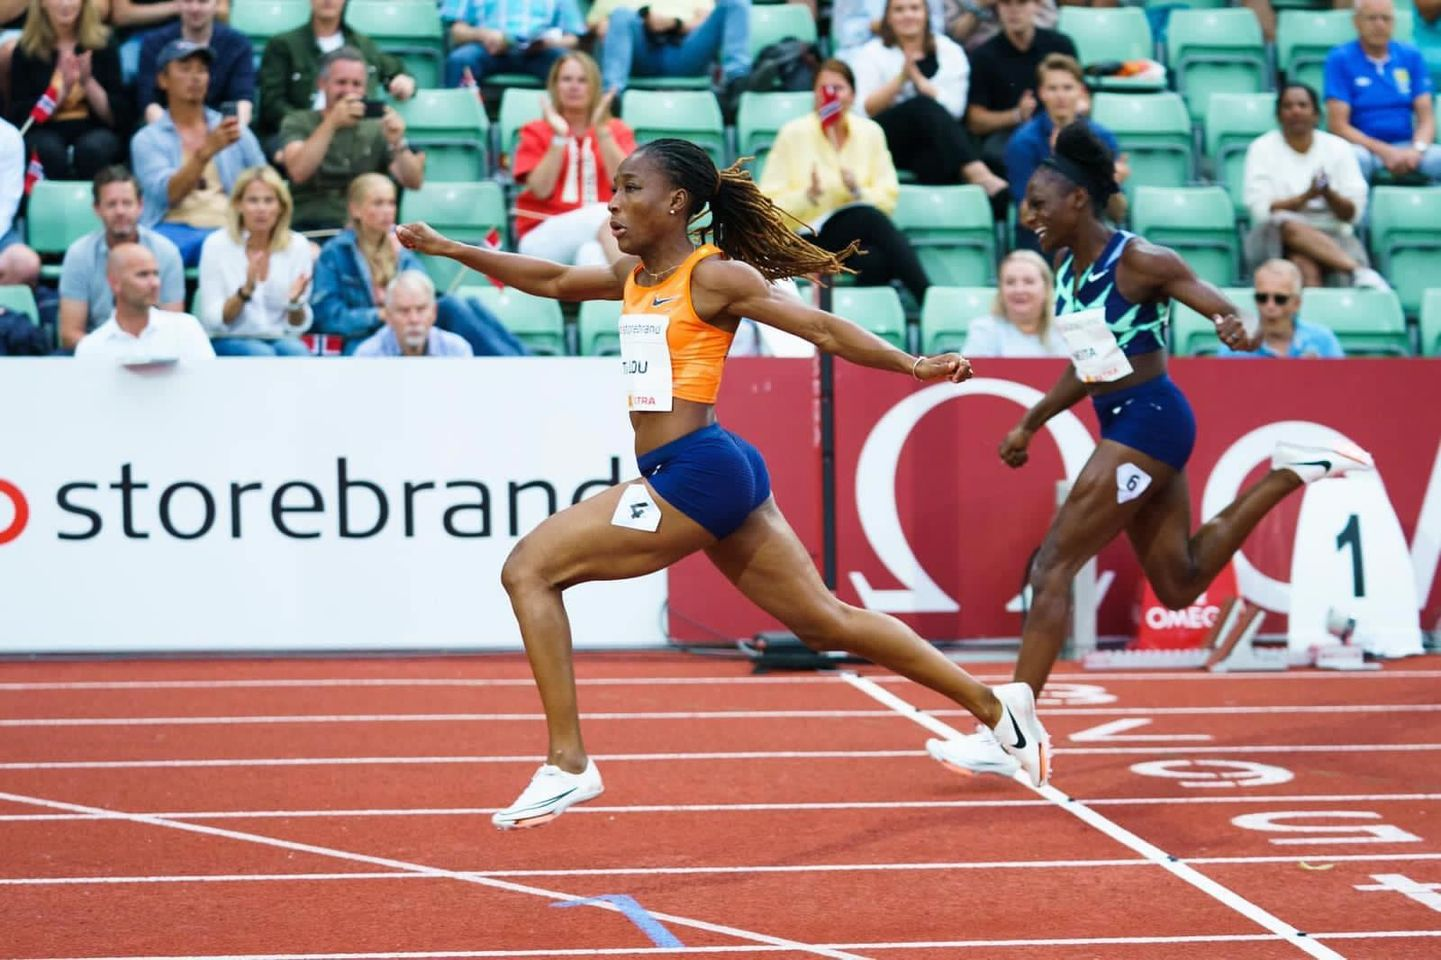 athletisme-diamond-league-grosse-performance-de-marie-josee-ta-lou-en-norvege